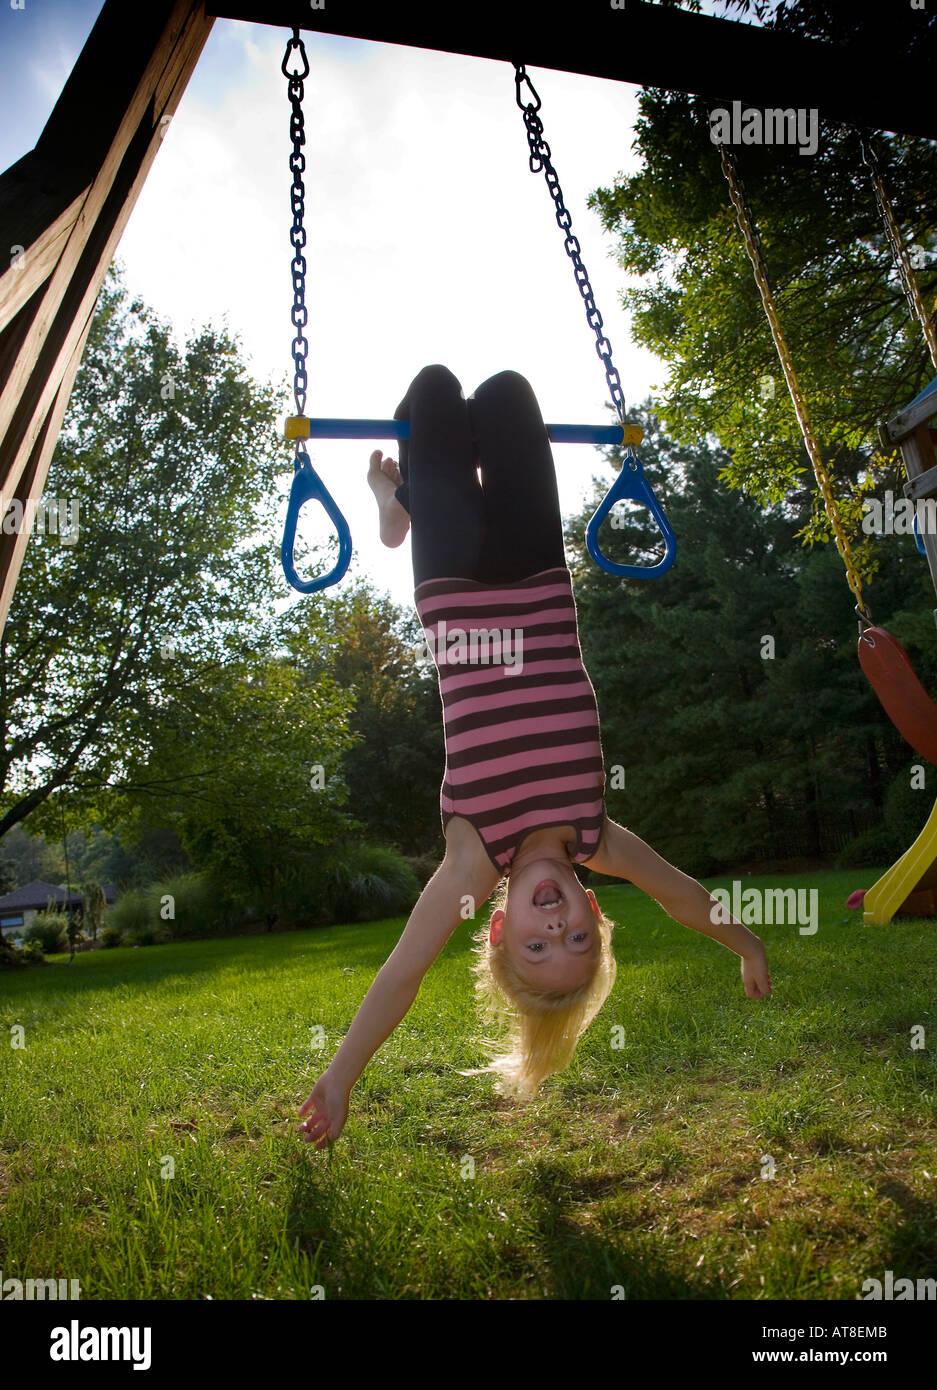 swinging upside down stock photos u0026 swinging upside down stock